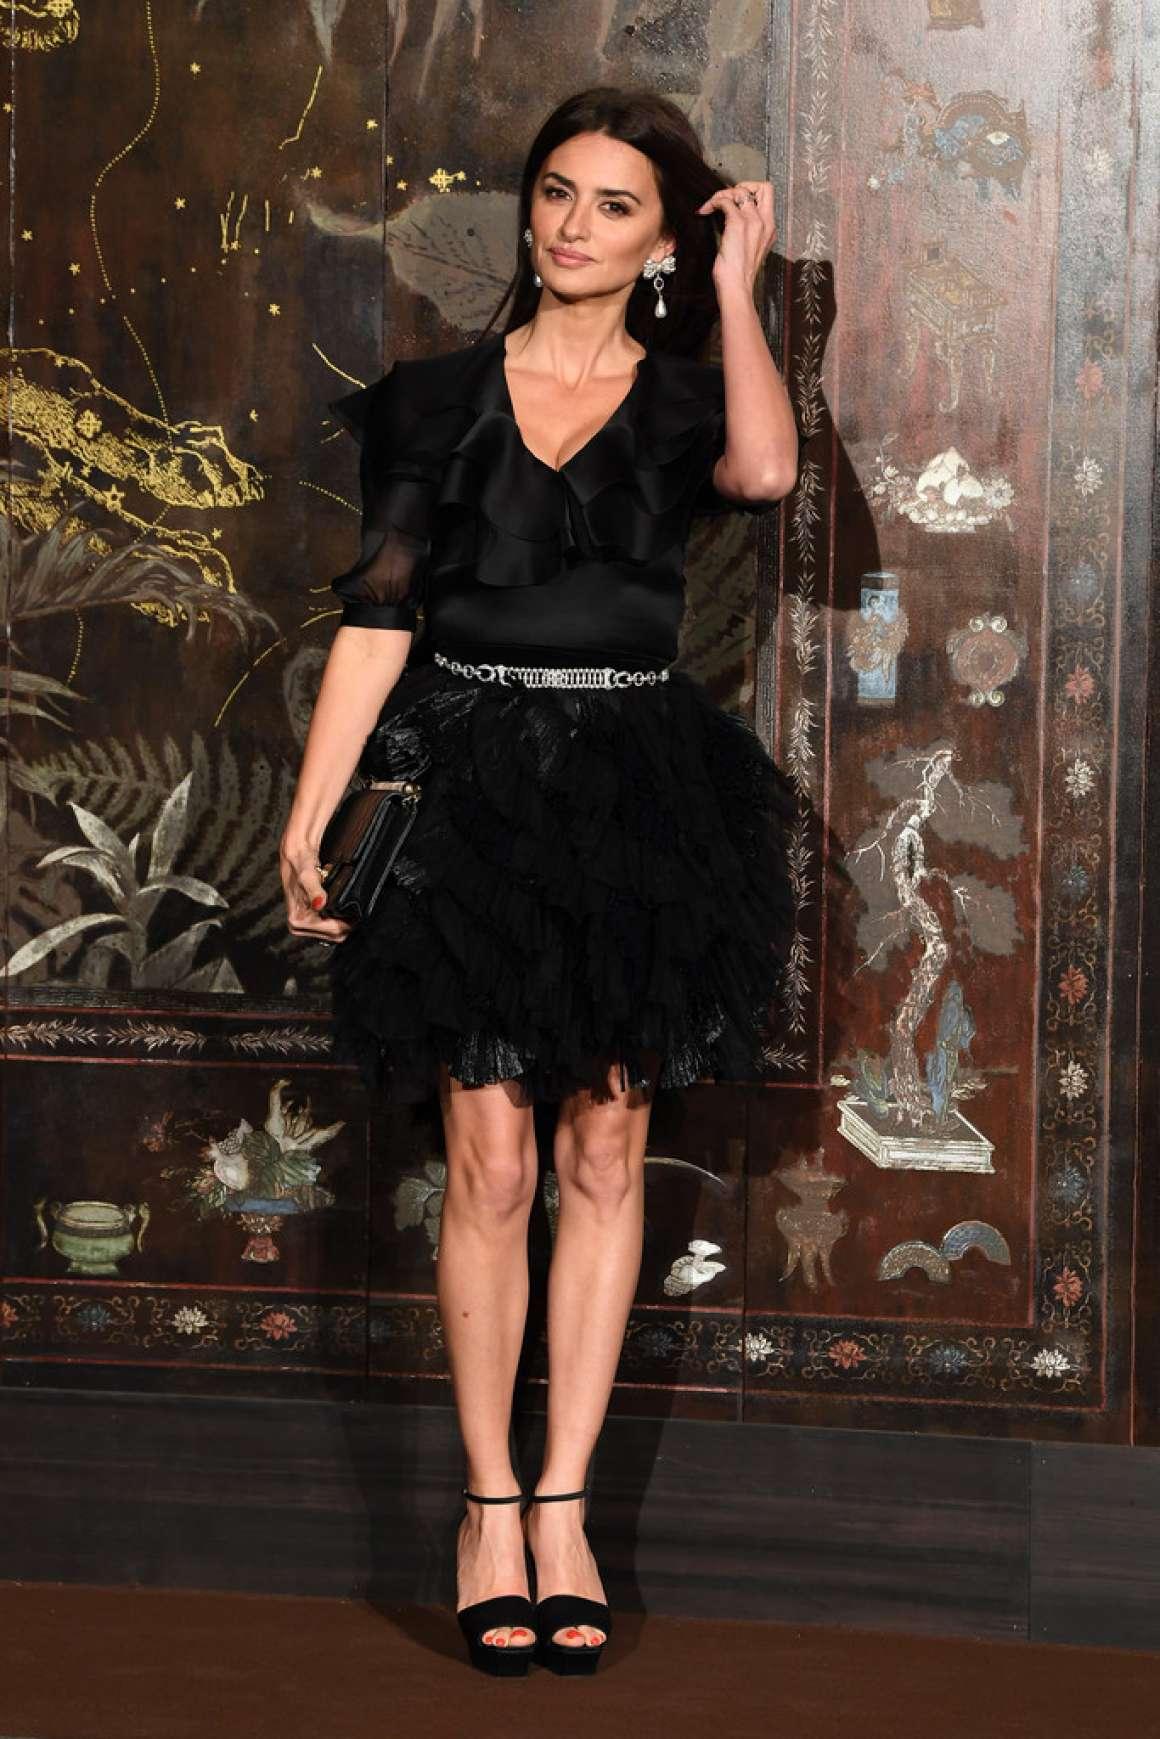 Penelope-Cruz---Chanel-Metiers-DArt-Fashion-Show-05.jpg